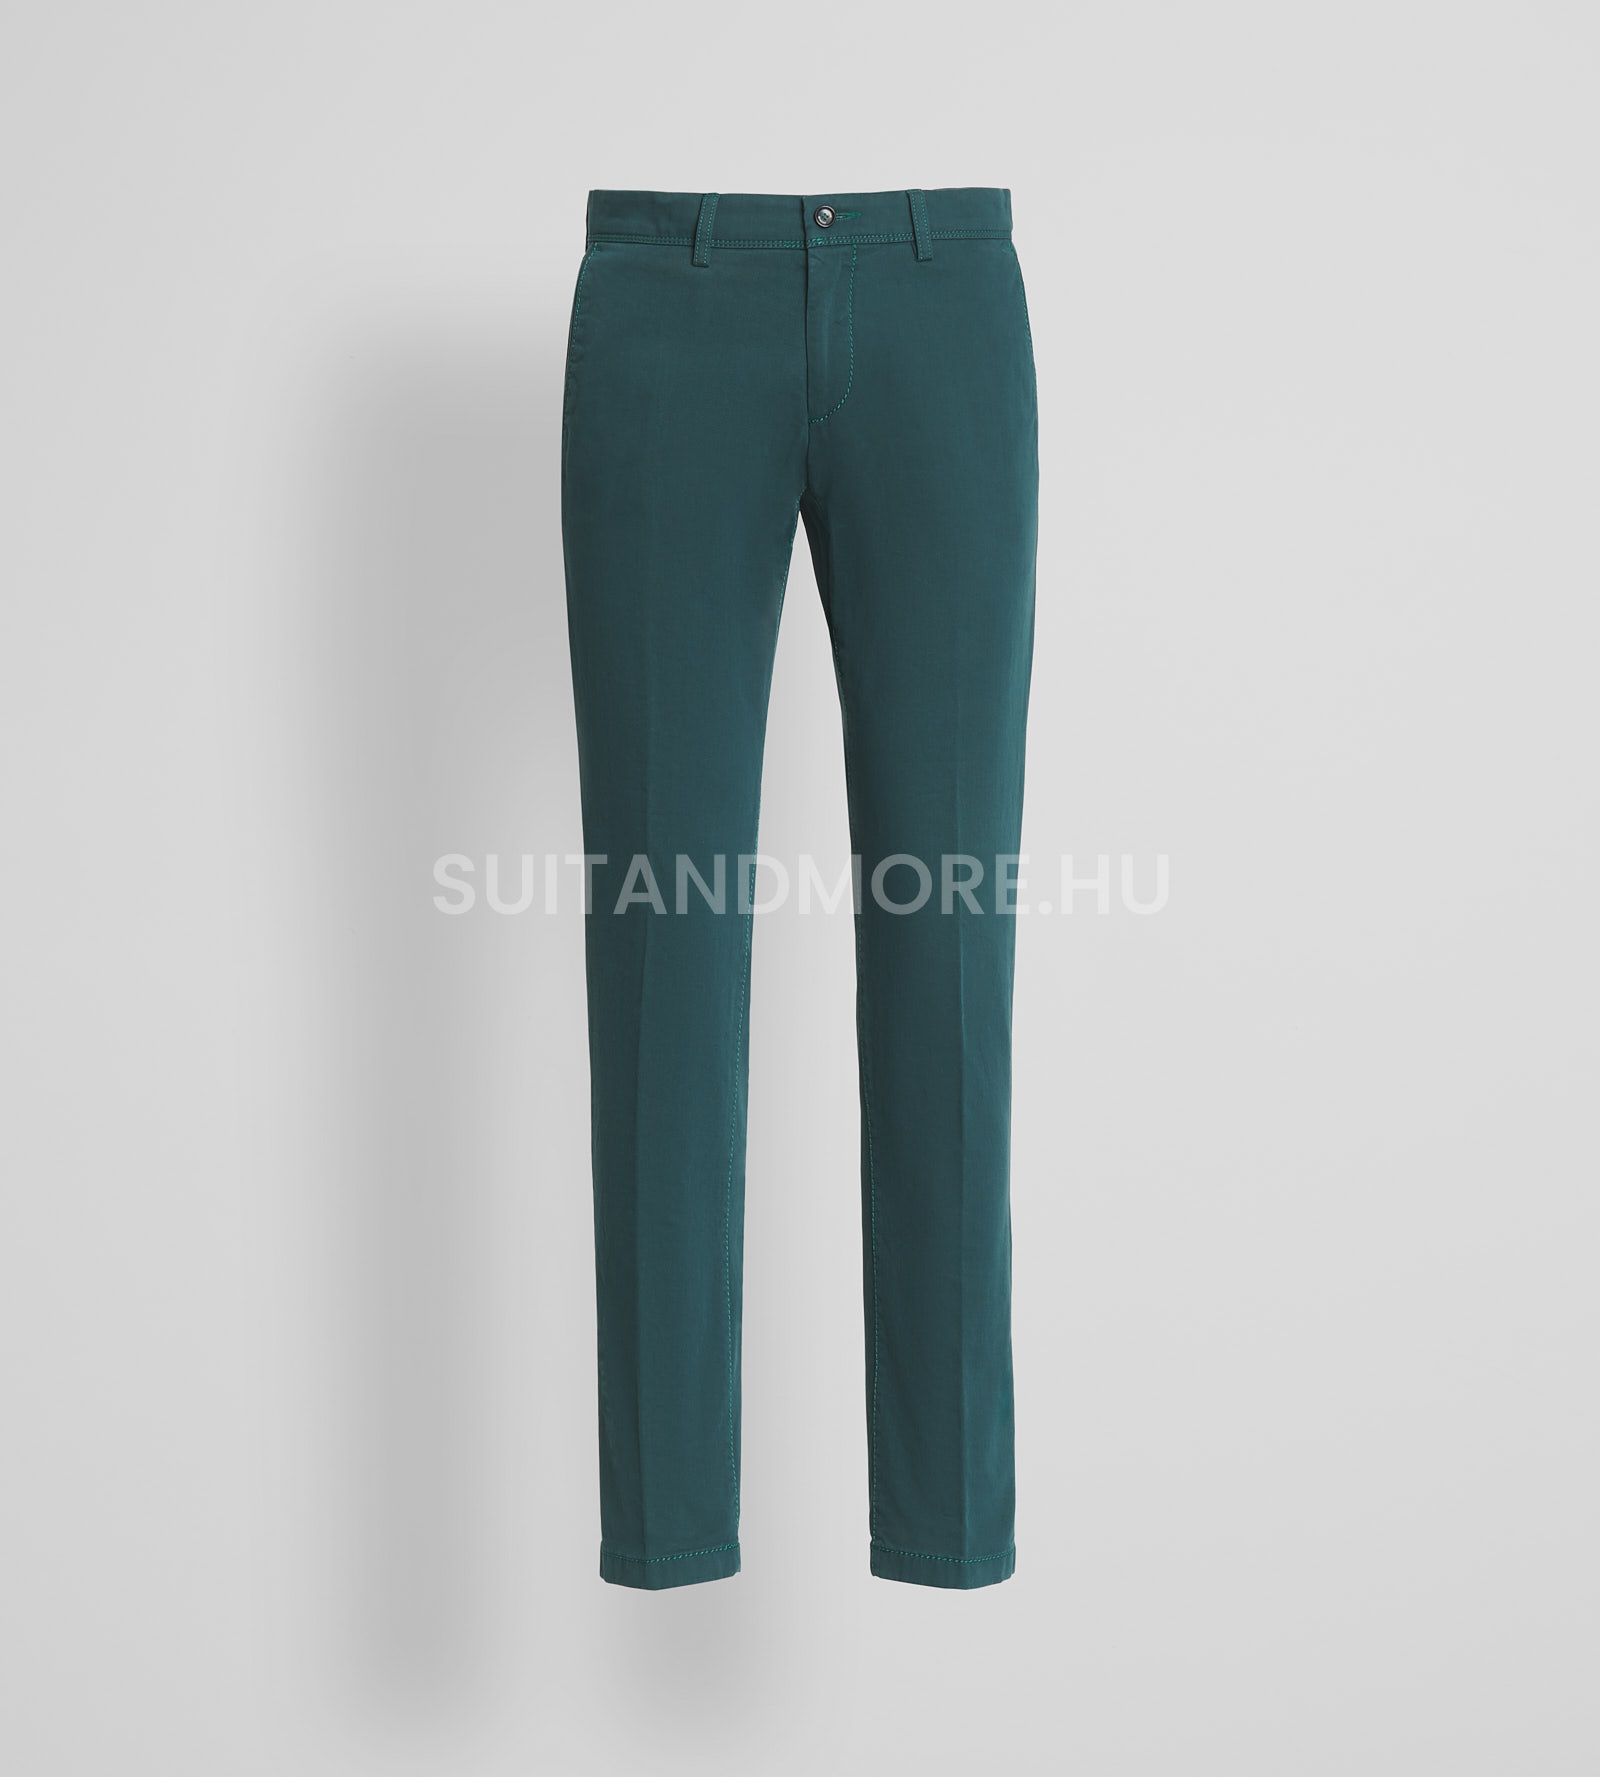 zöld-extra-slim-fit-pamut-sztreccs-chino-nadrág-NIGEL-88160-51-01